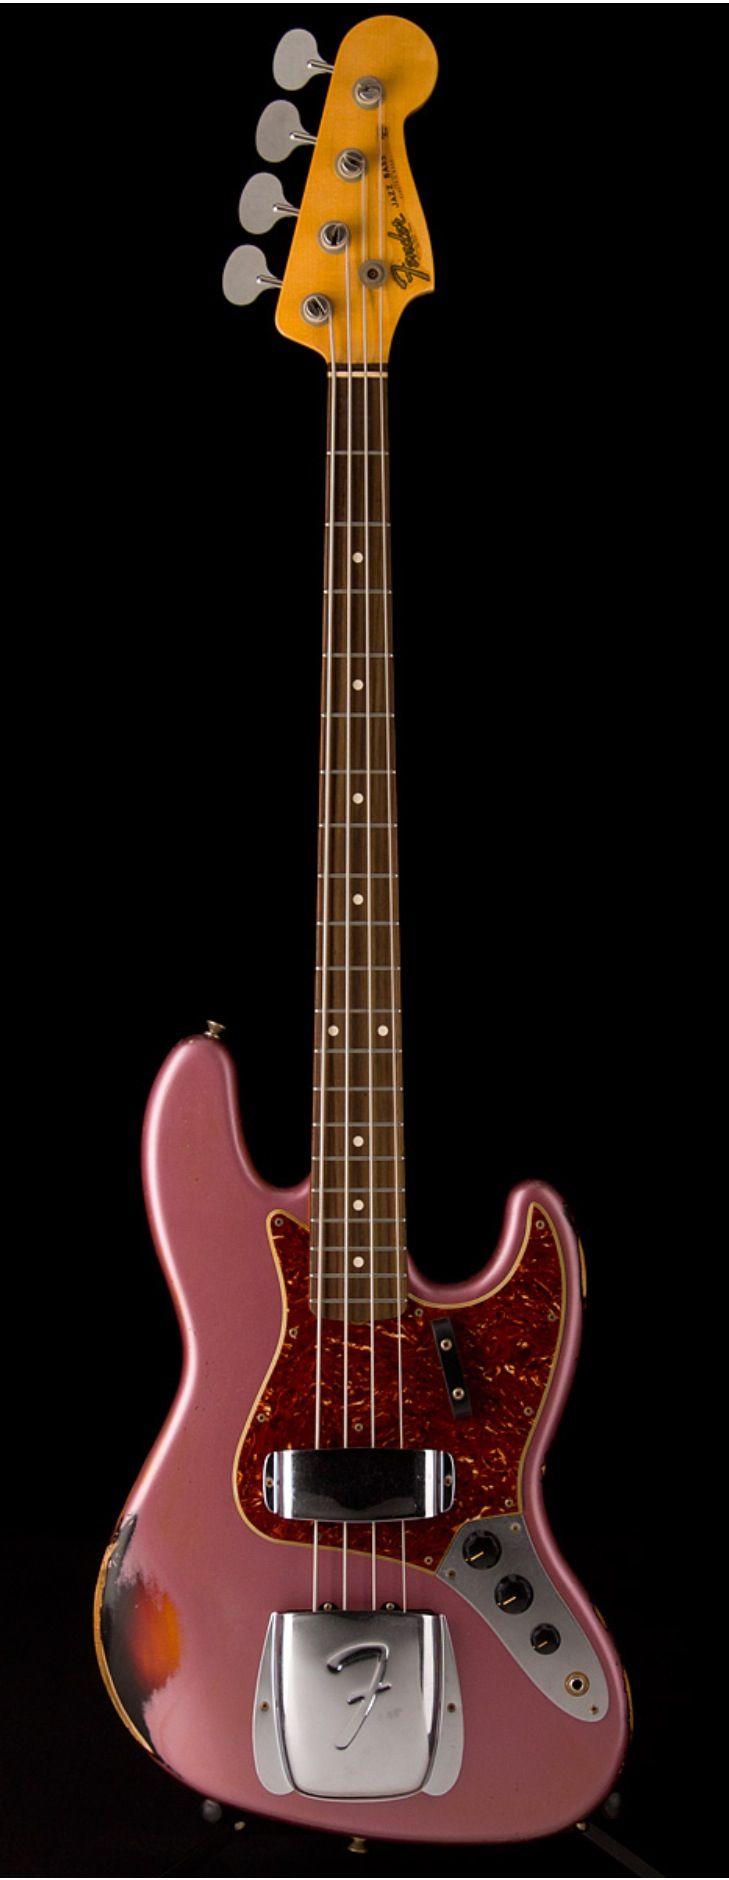 FENDER Custom Shop 1964 J Bass Relic  Burgandy Mist Metallic over 3-Tone Sunburst | Guitar Center